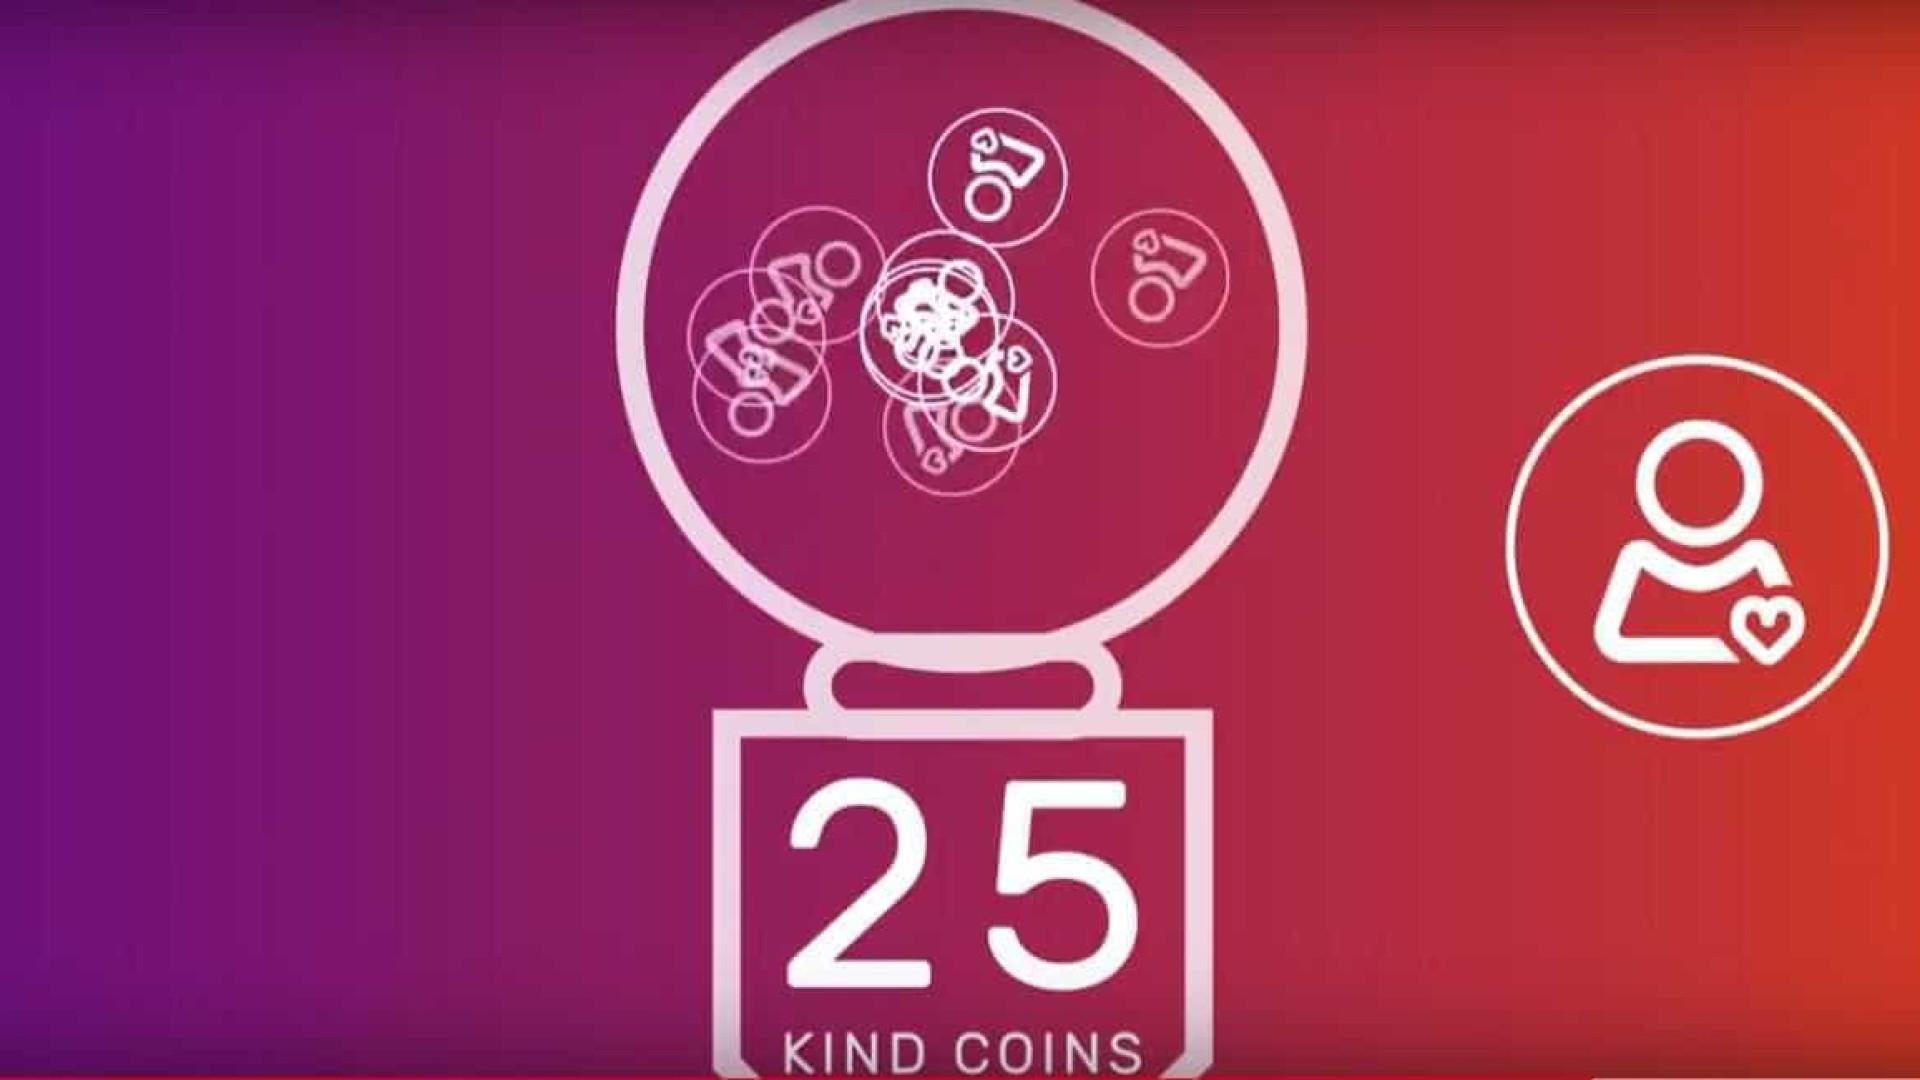 Kind Coin, a moeda solidária que permite saber tudo sobre o que doou